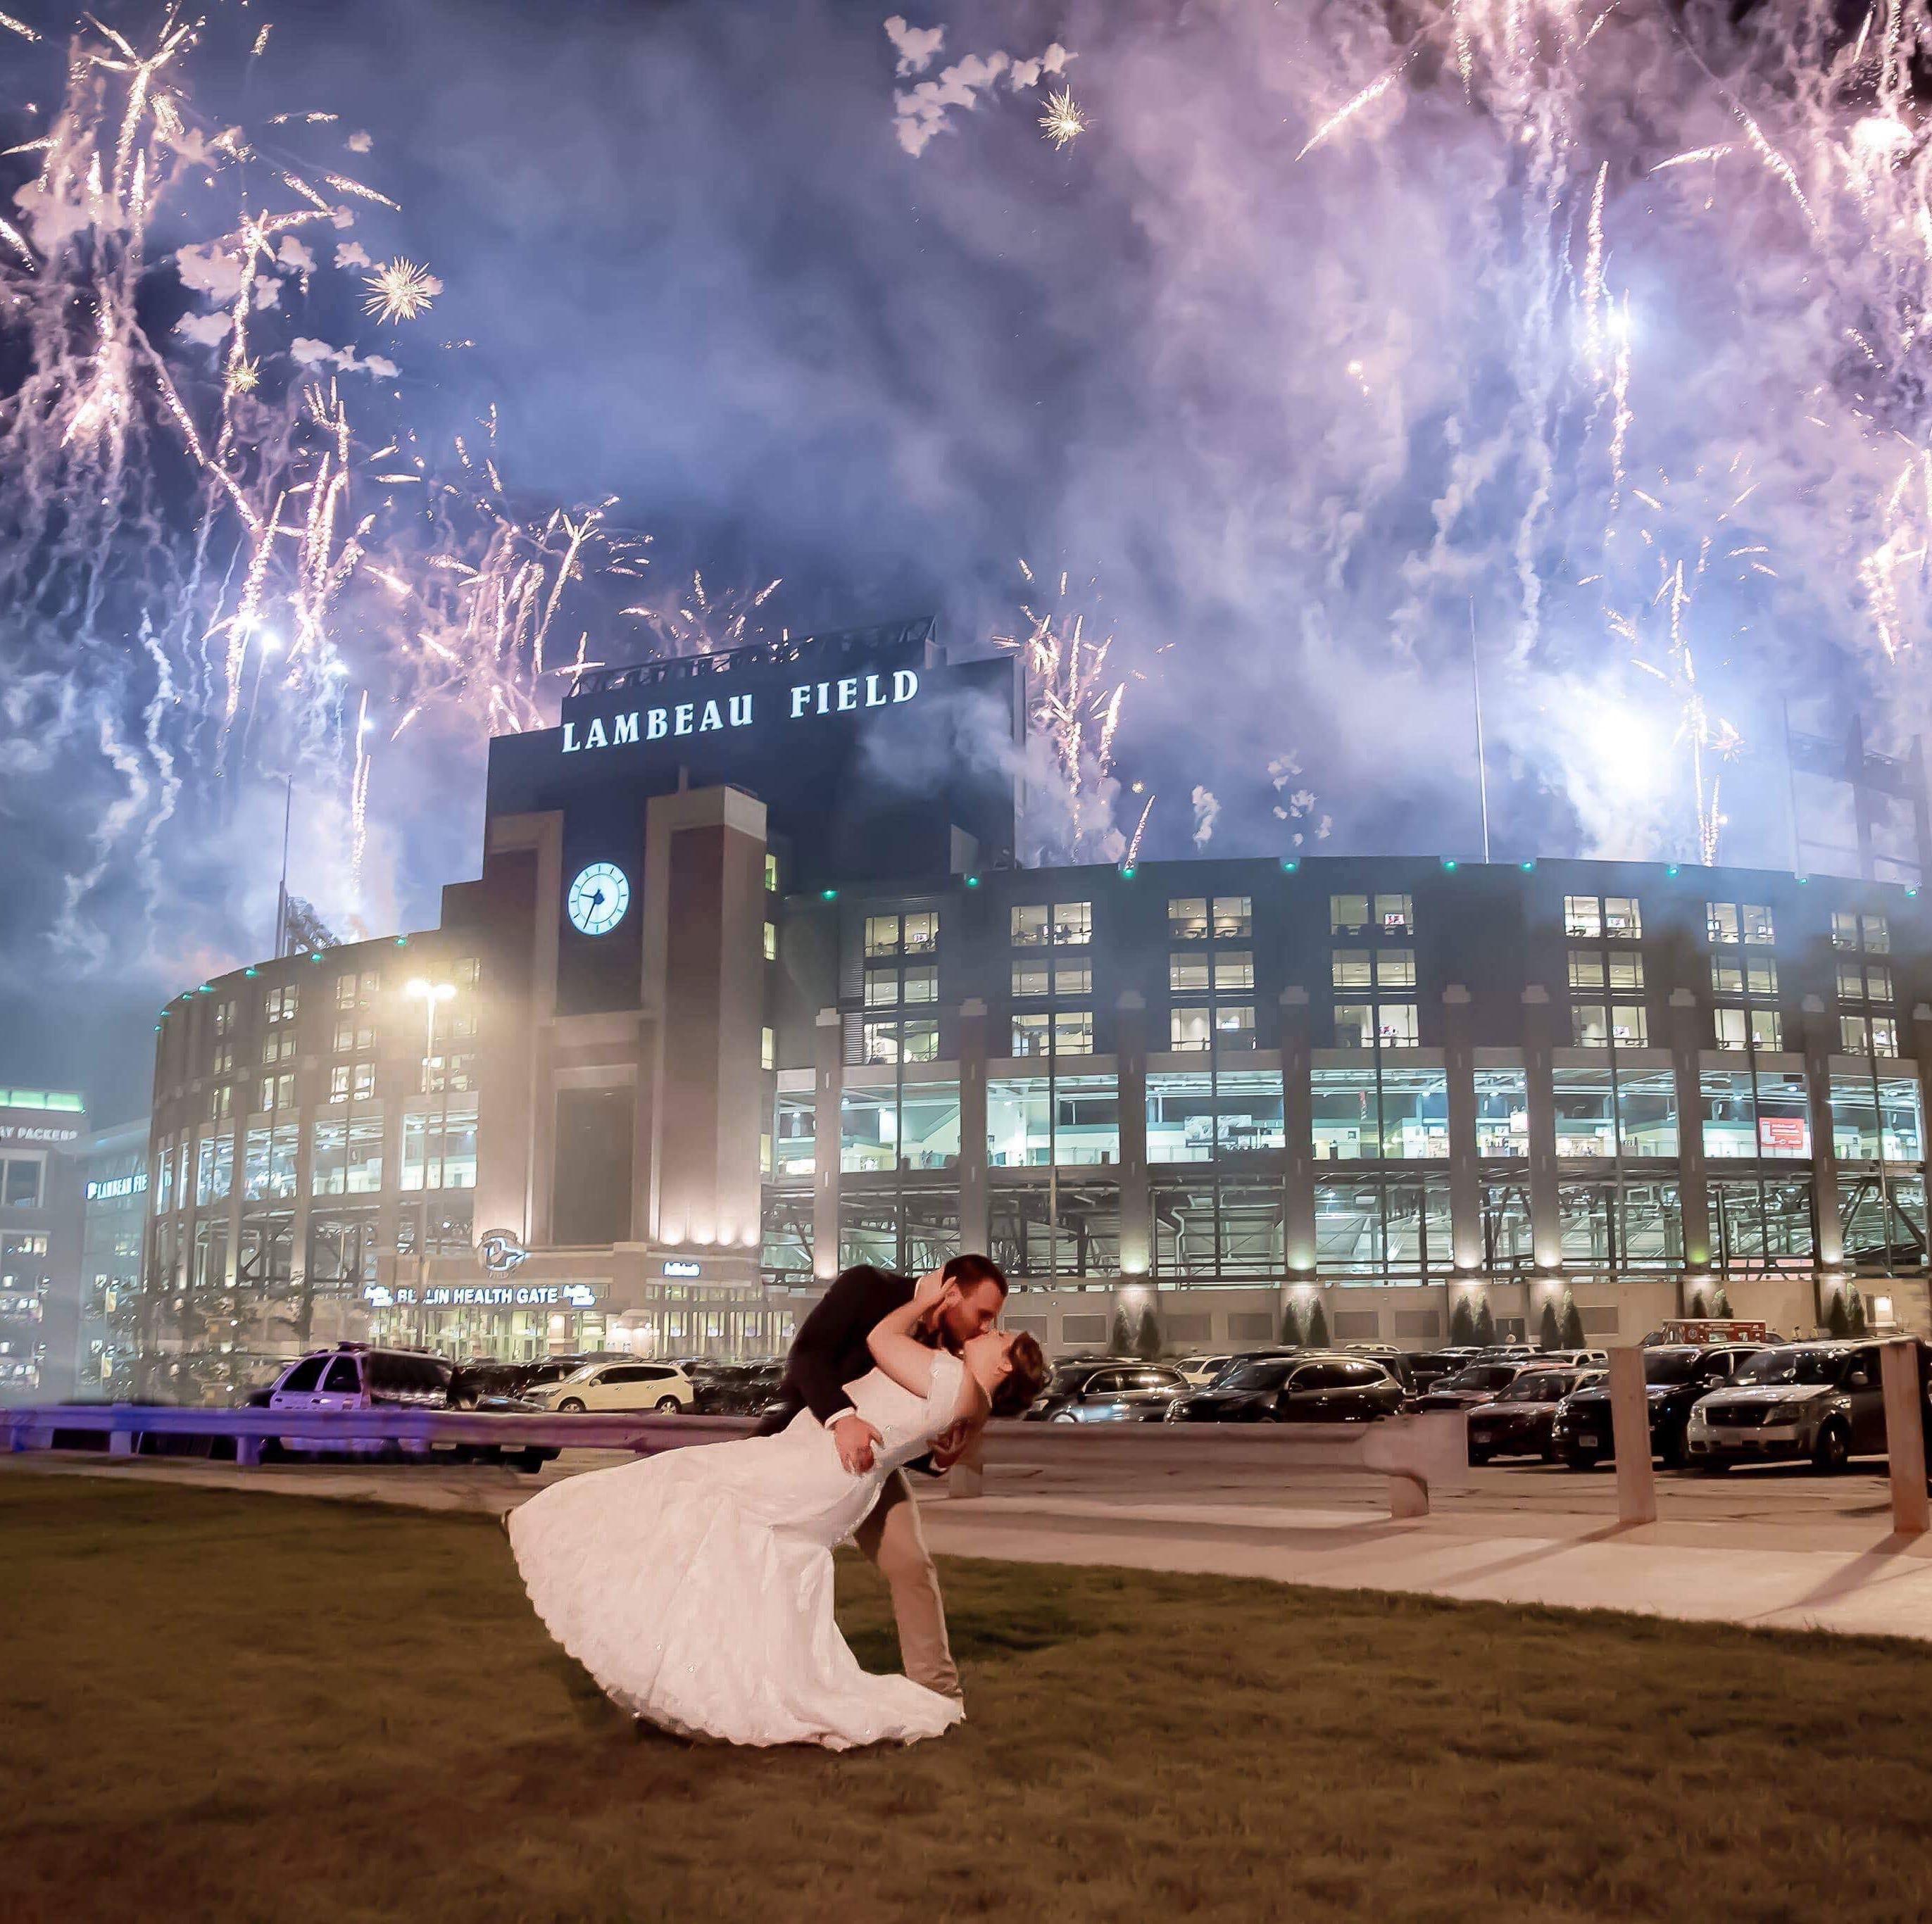 Newlyweds get fairy-tale photo finish to wedding day with fireworks outside Lambeau